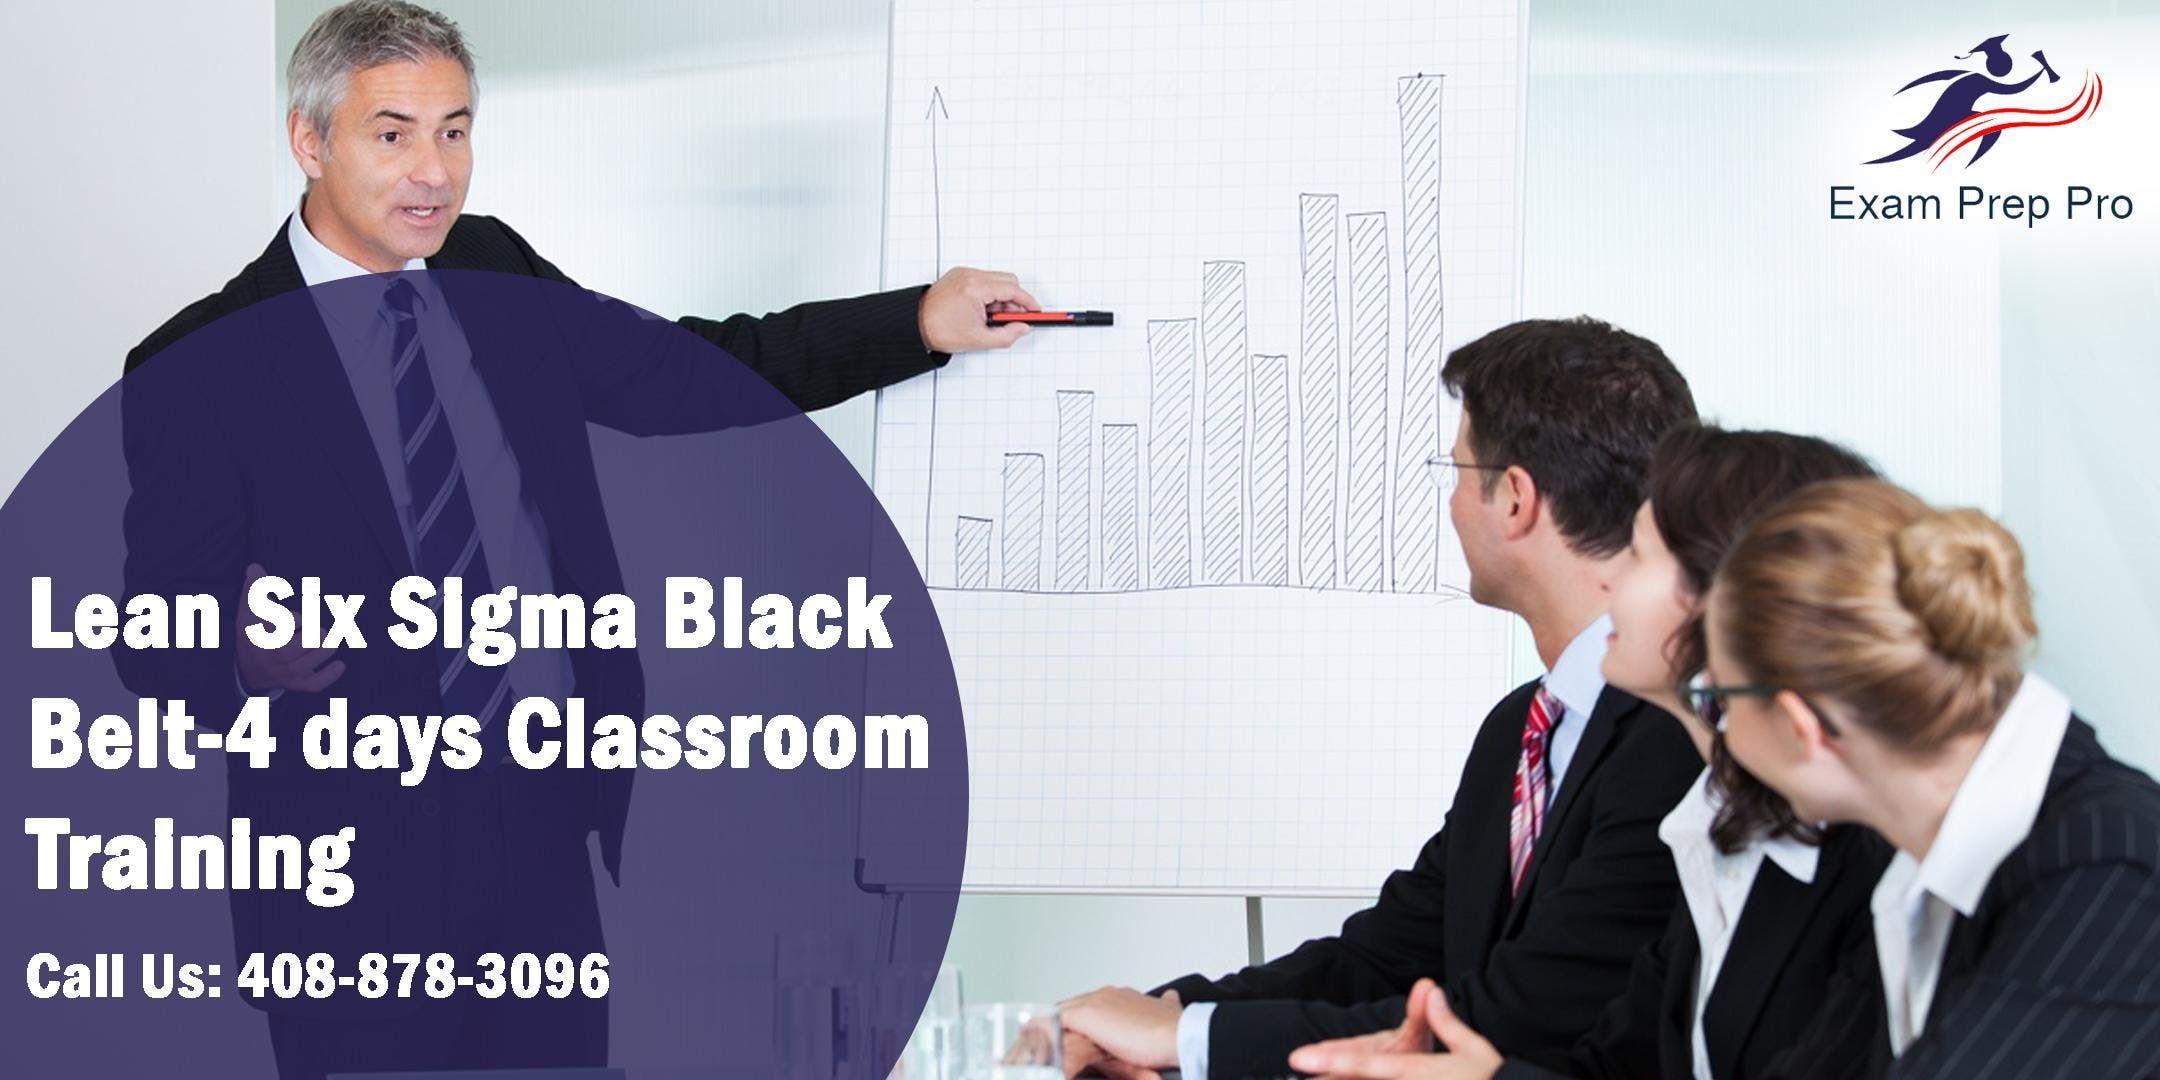 Lean Six Sigma Black Belt-4 days Classroom Training in Columbia SC